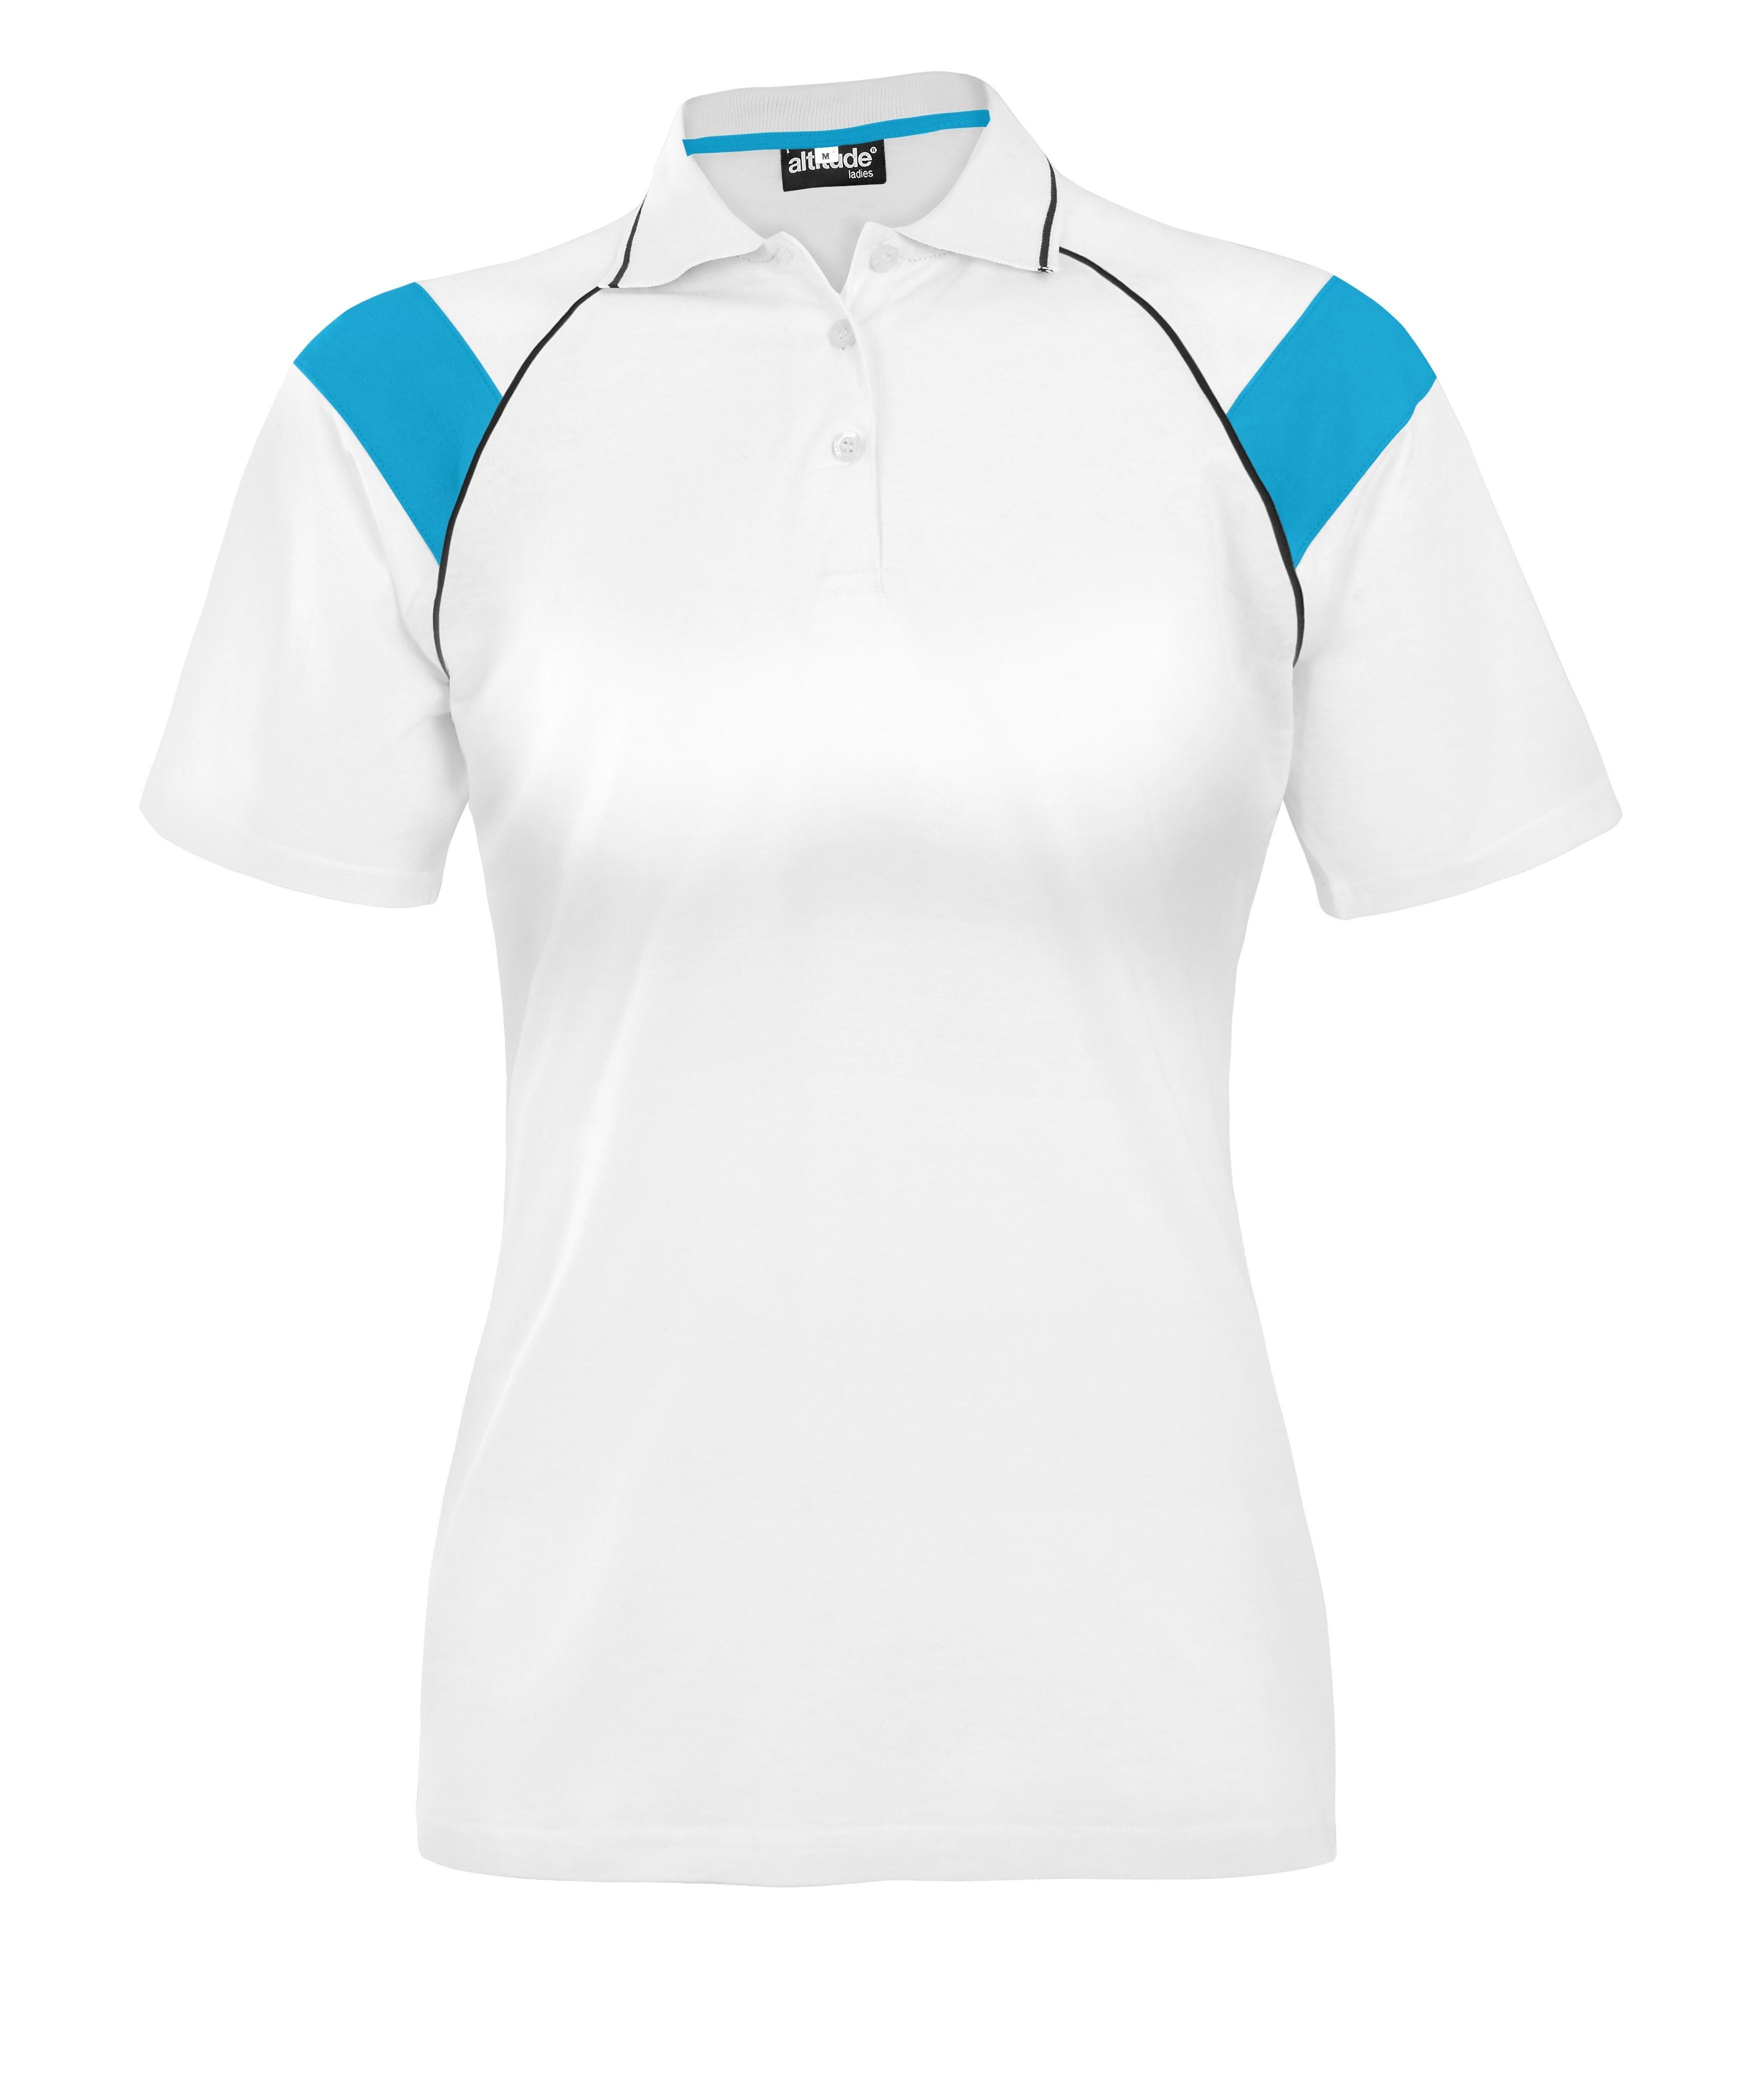 Ladies Score Golf Shirt - Cyan Only